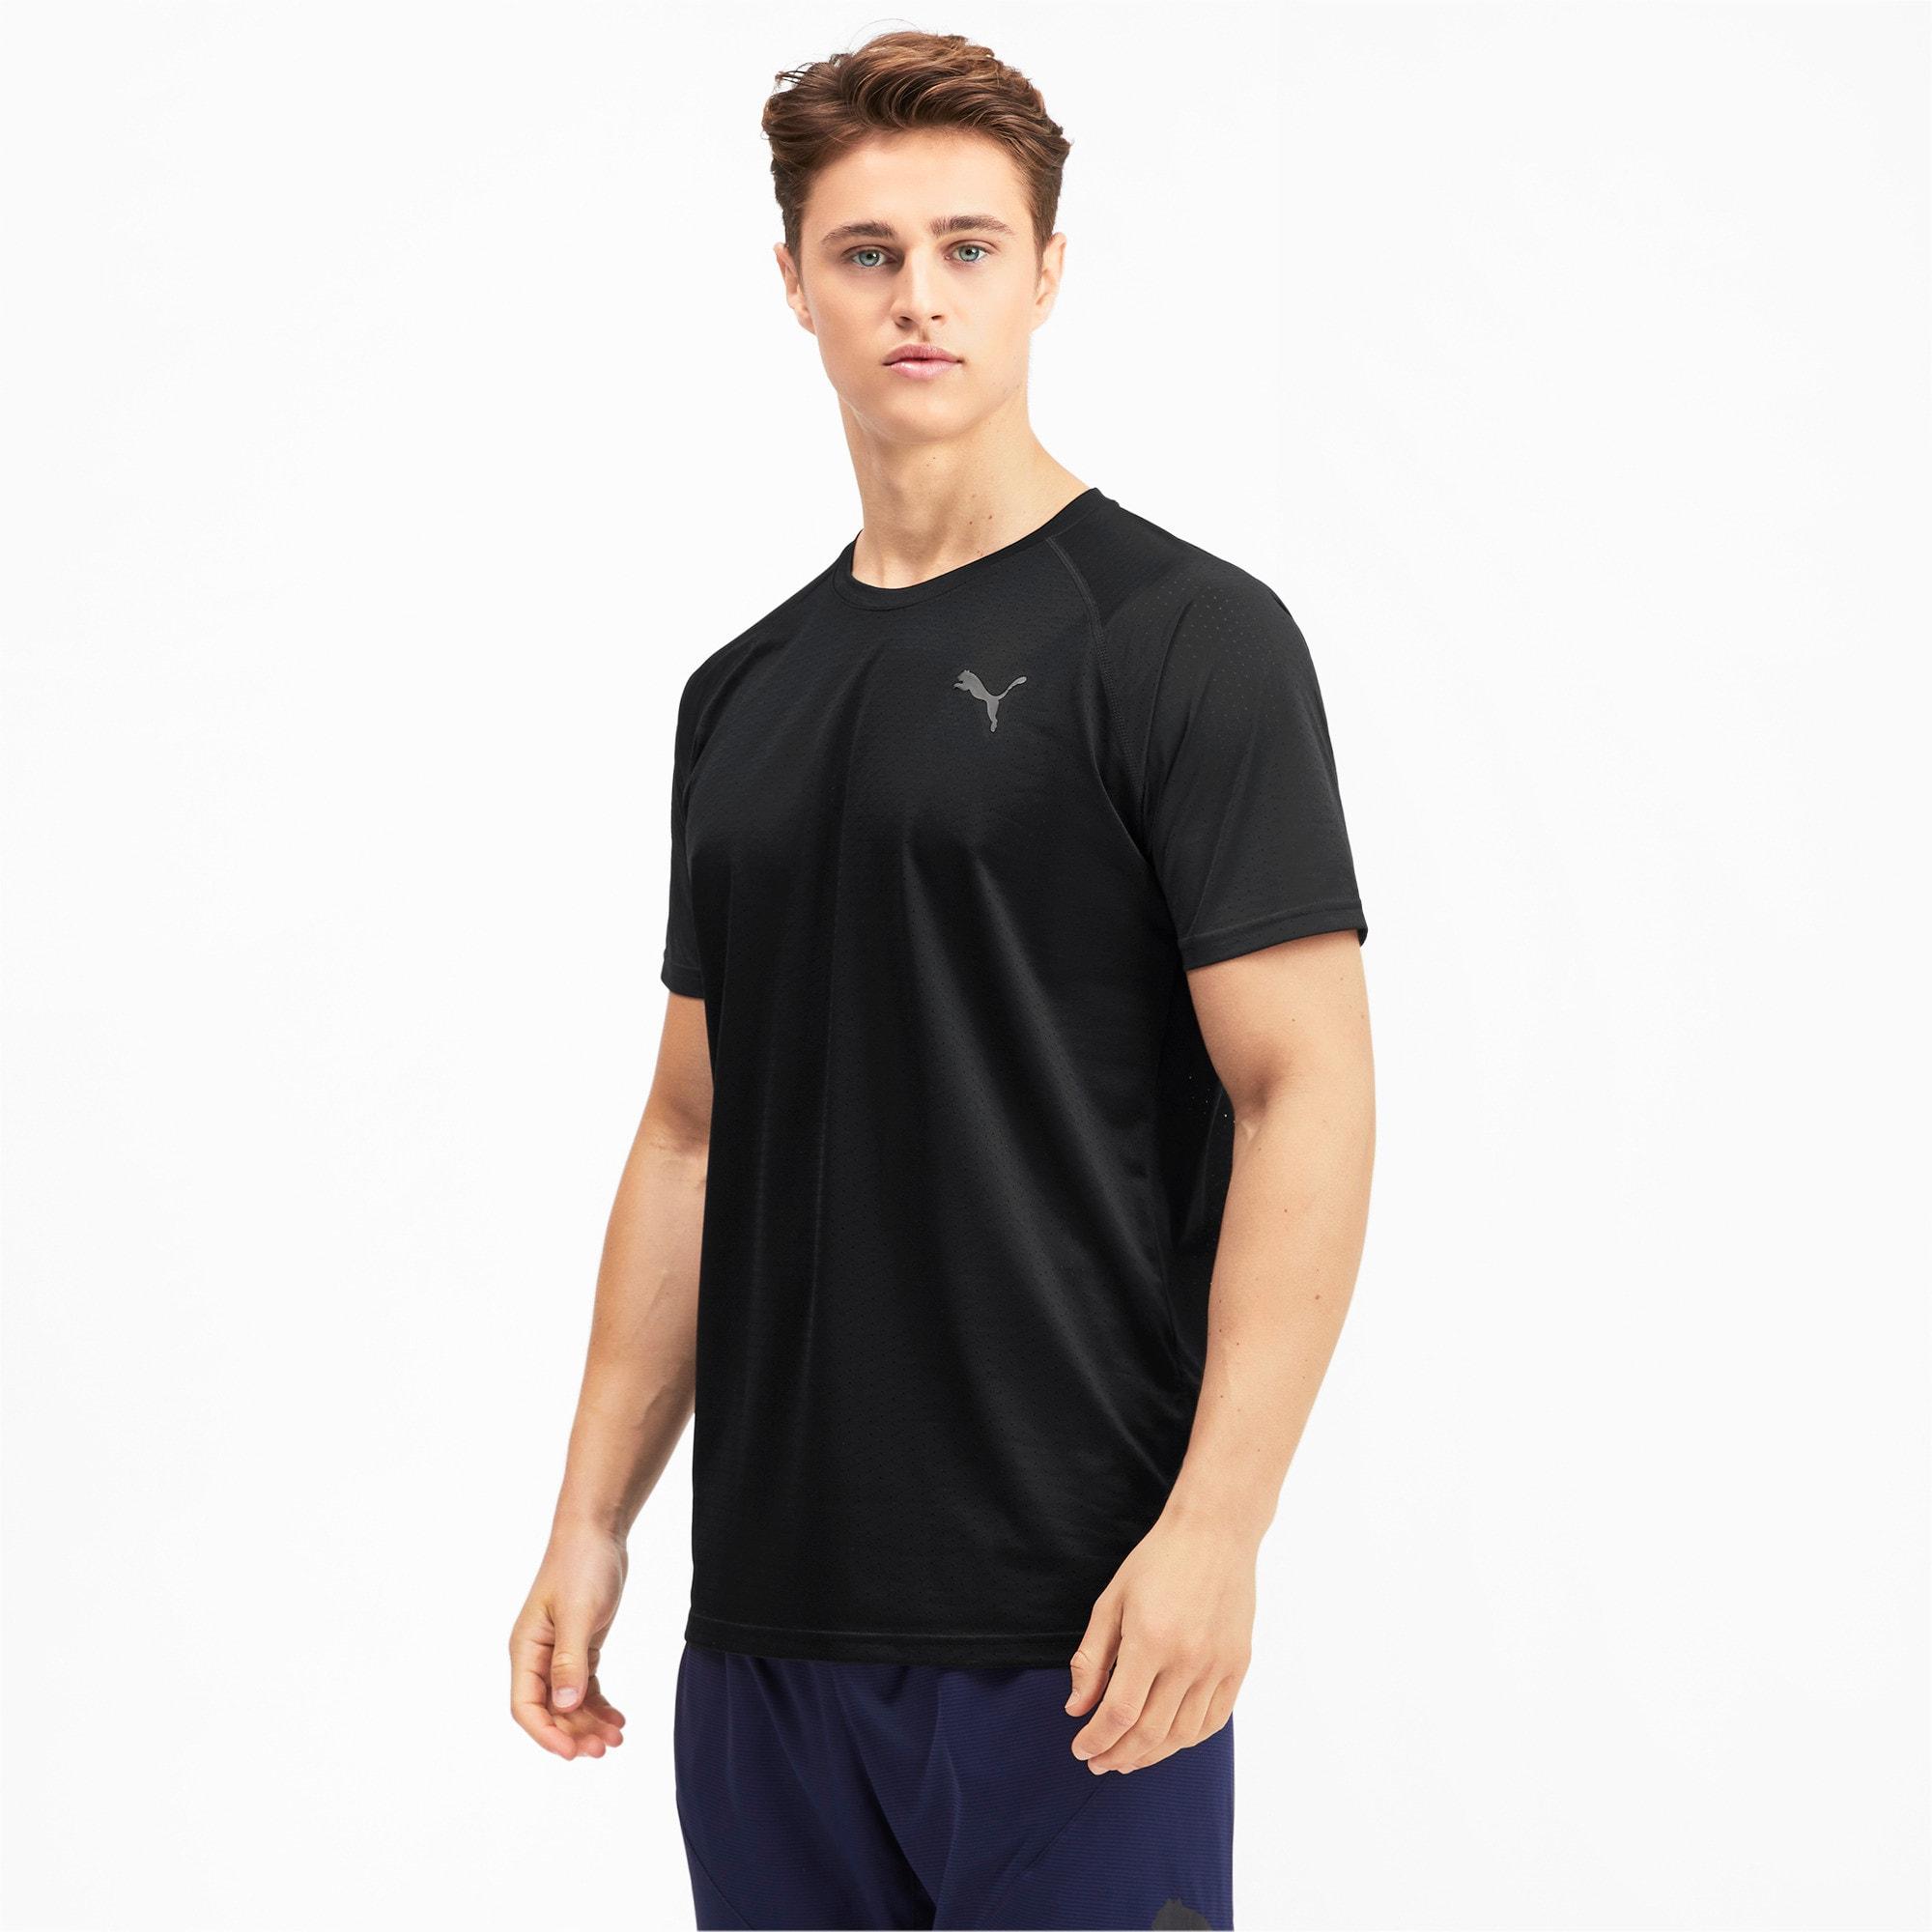 PUMA dryCELL Men's Training T-Shirt